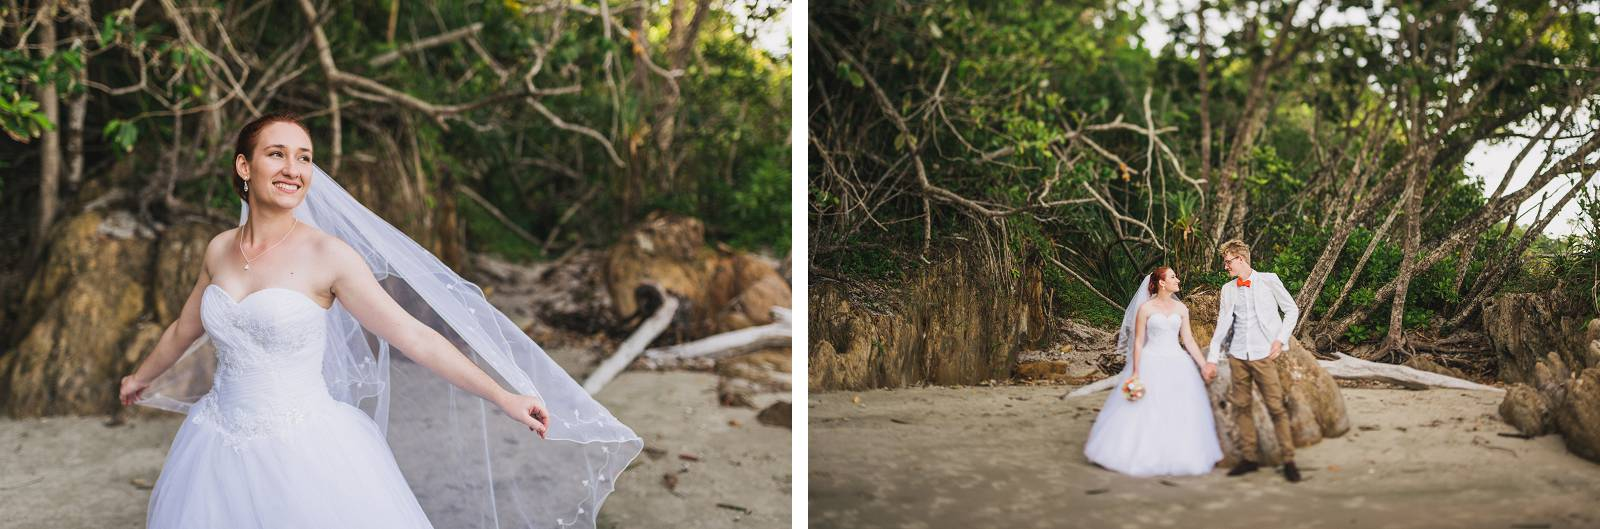 Etty Bay Wedding Photography